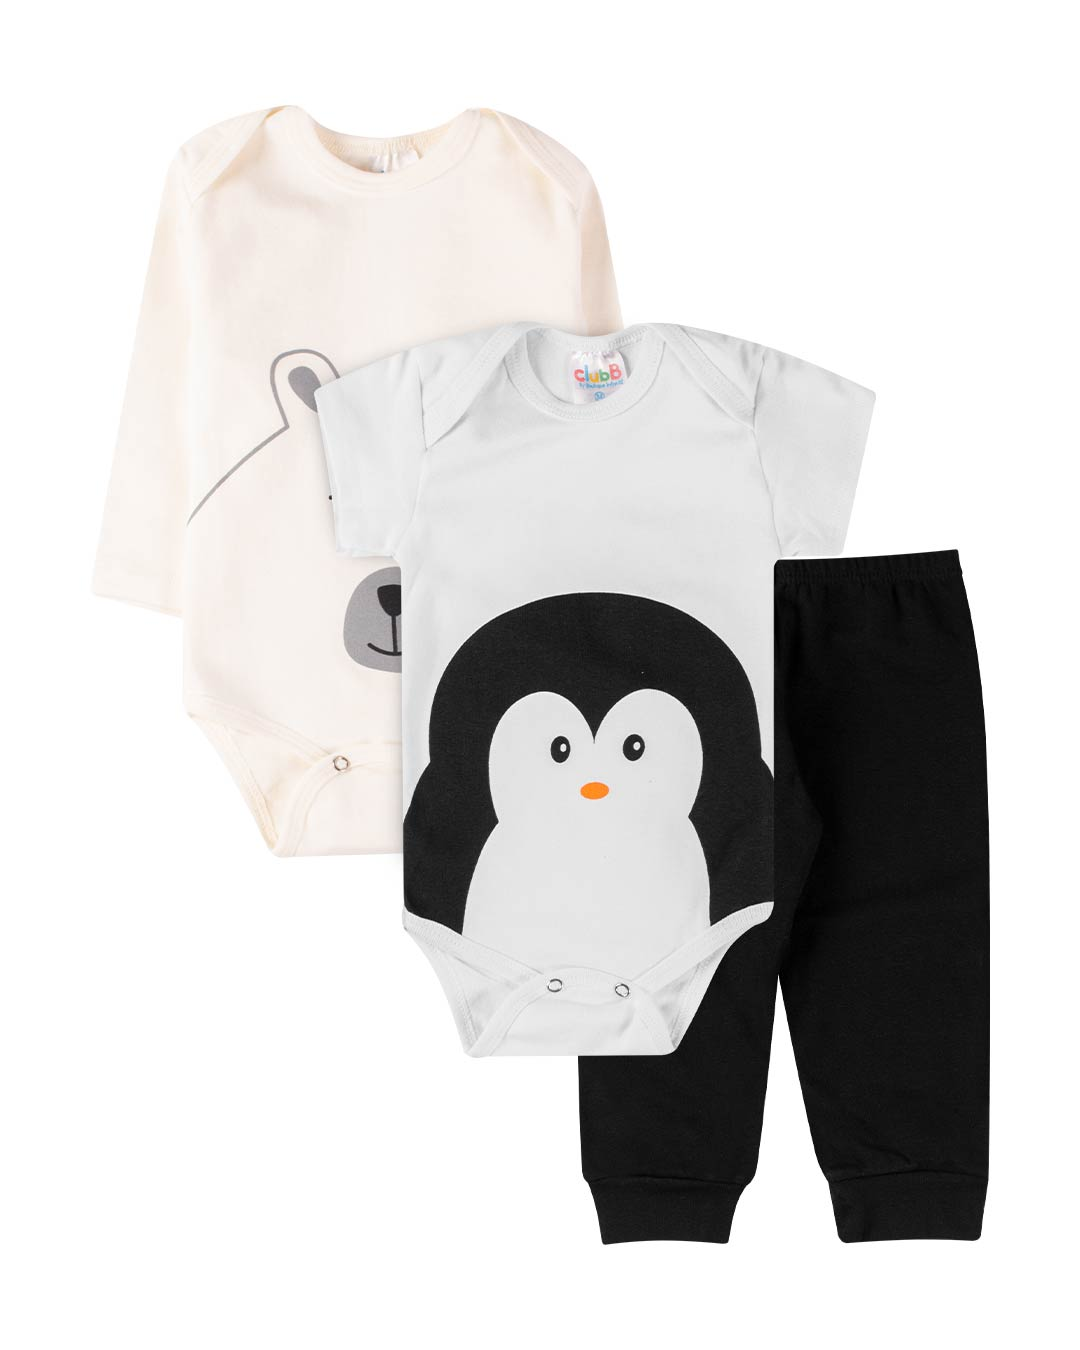 Kit Body 3 Peças Pinguim Off White - Sorriso Kids